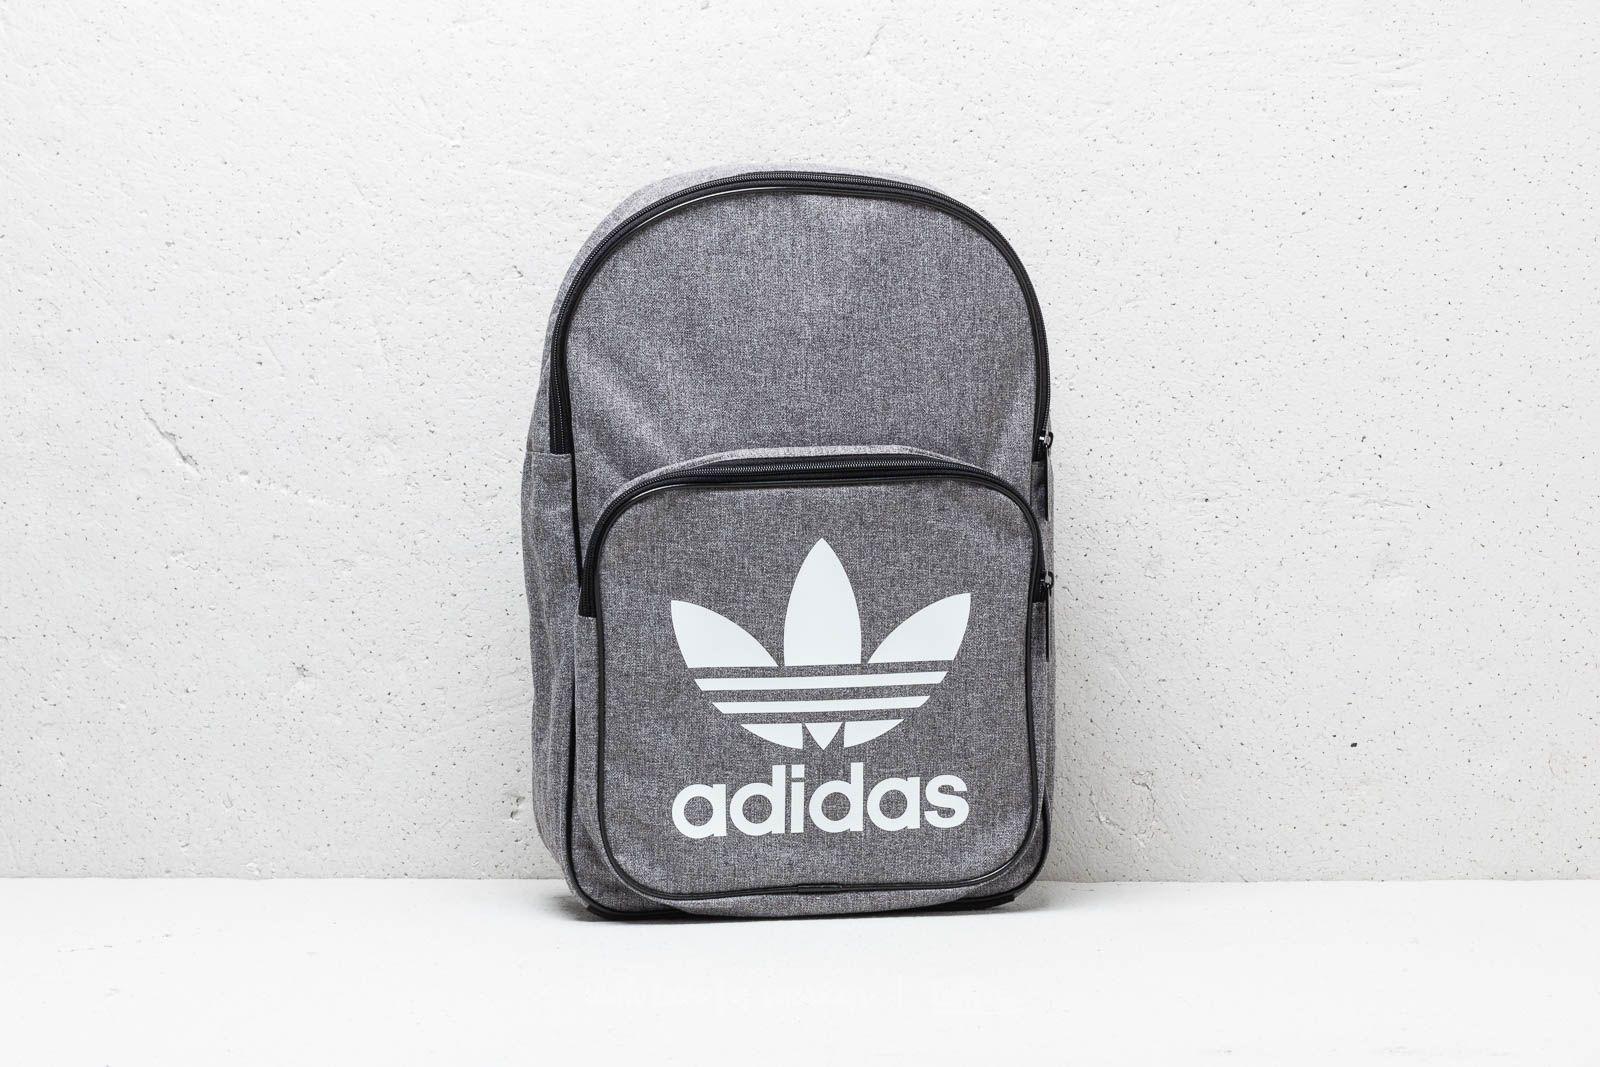 Adidas Class Casual Rucksack